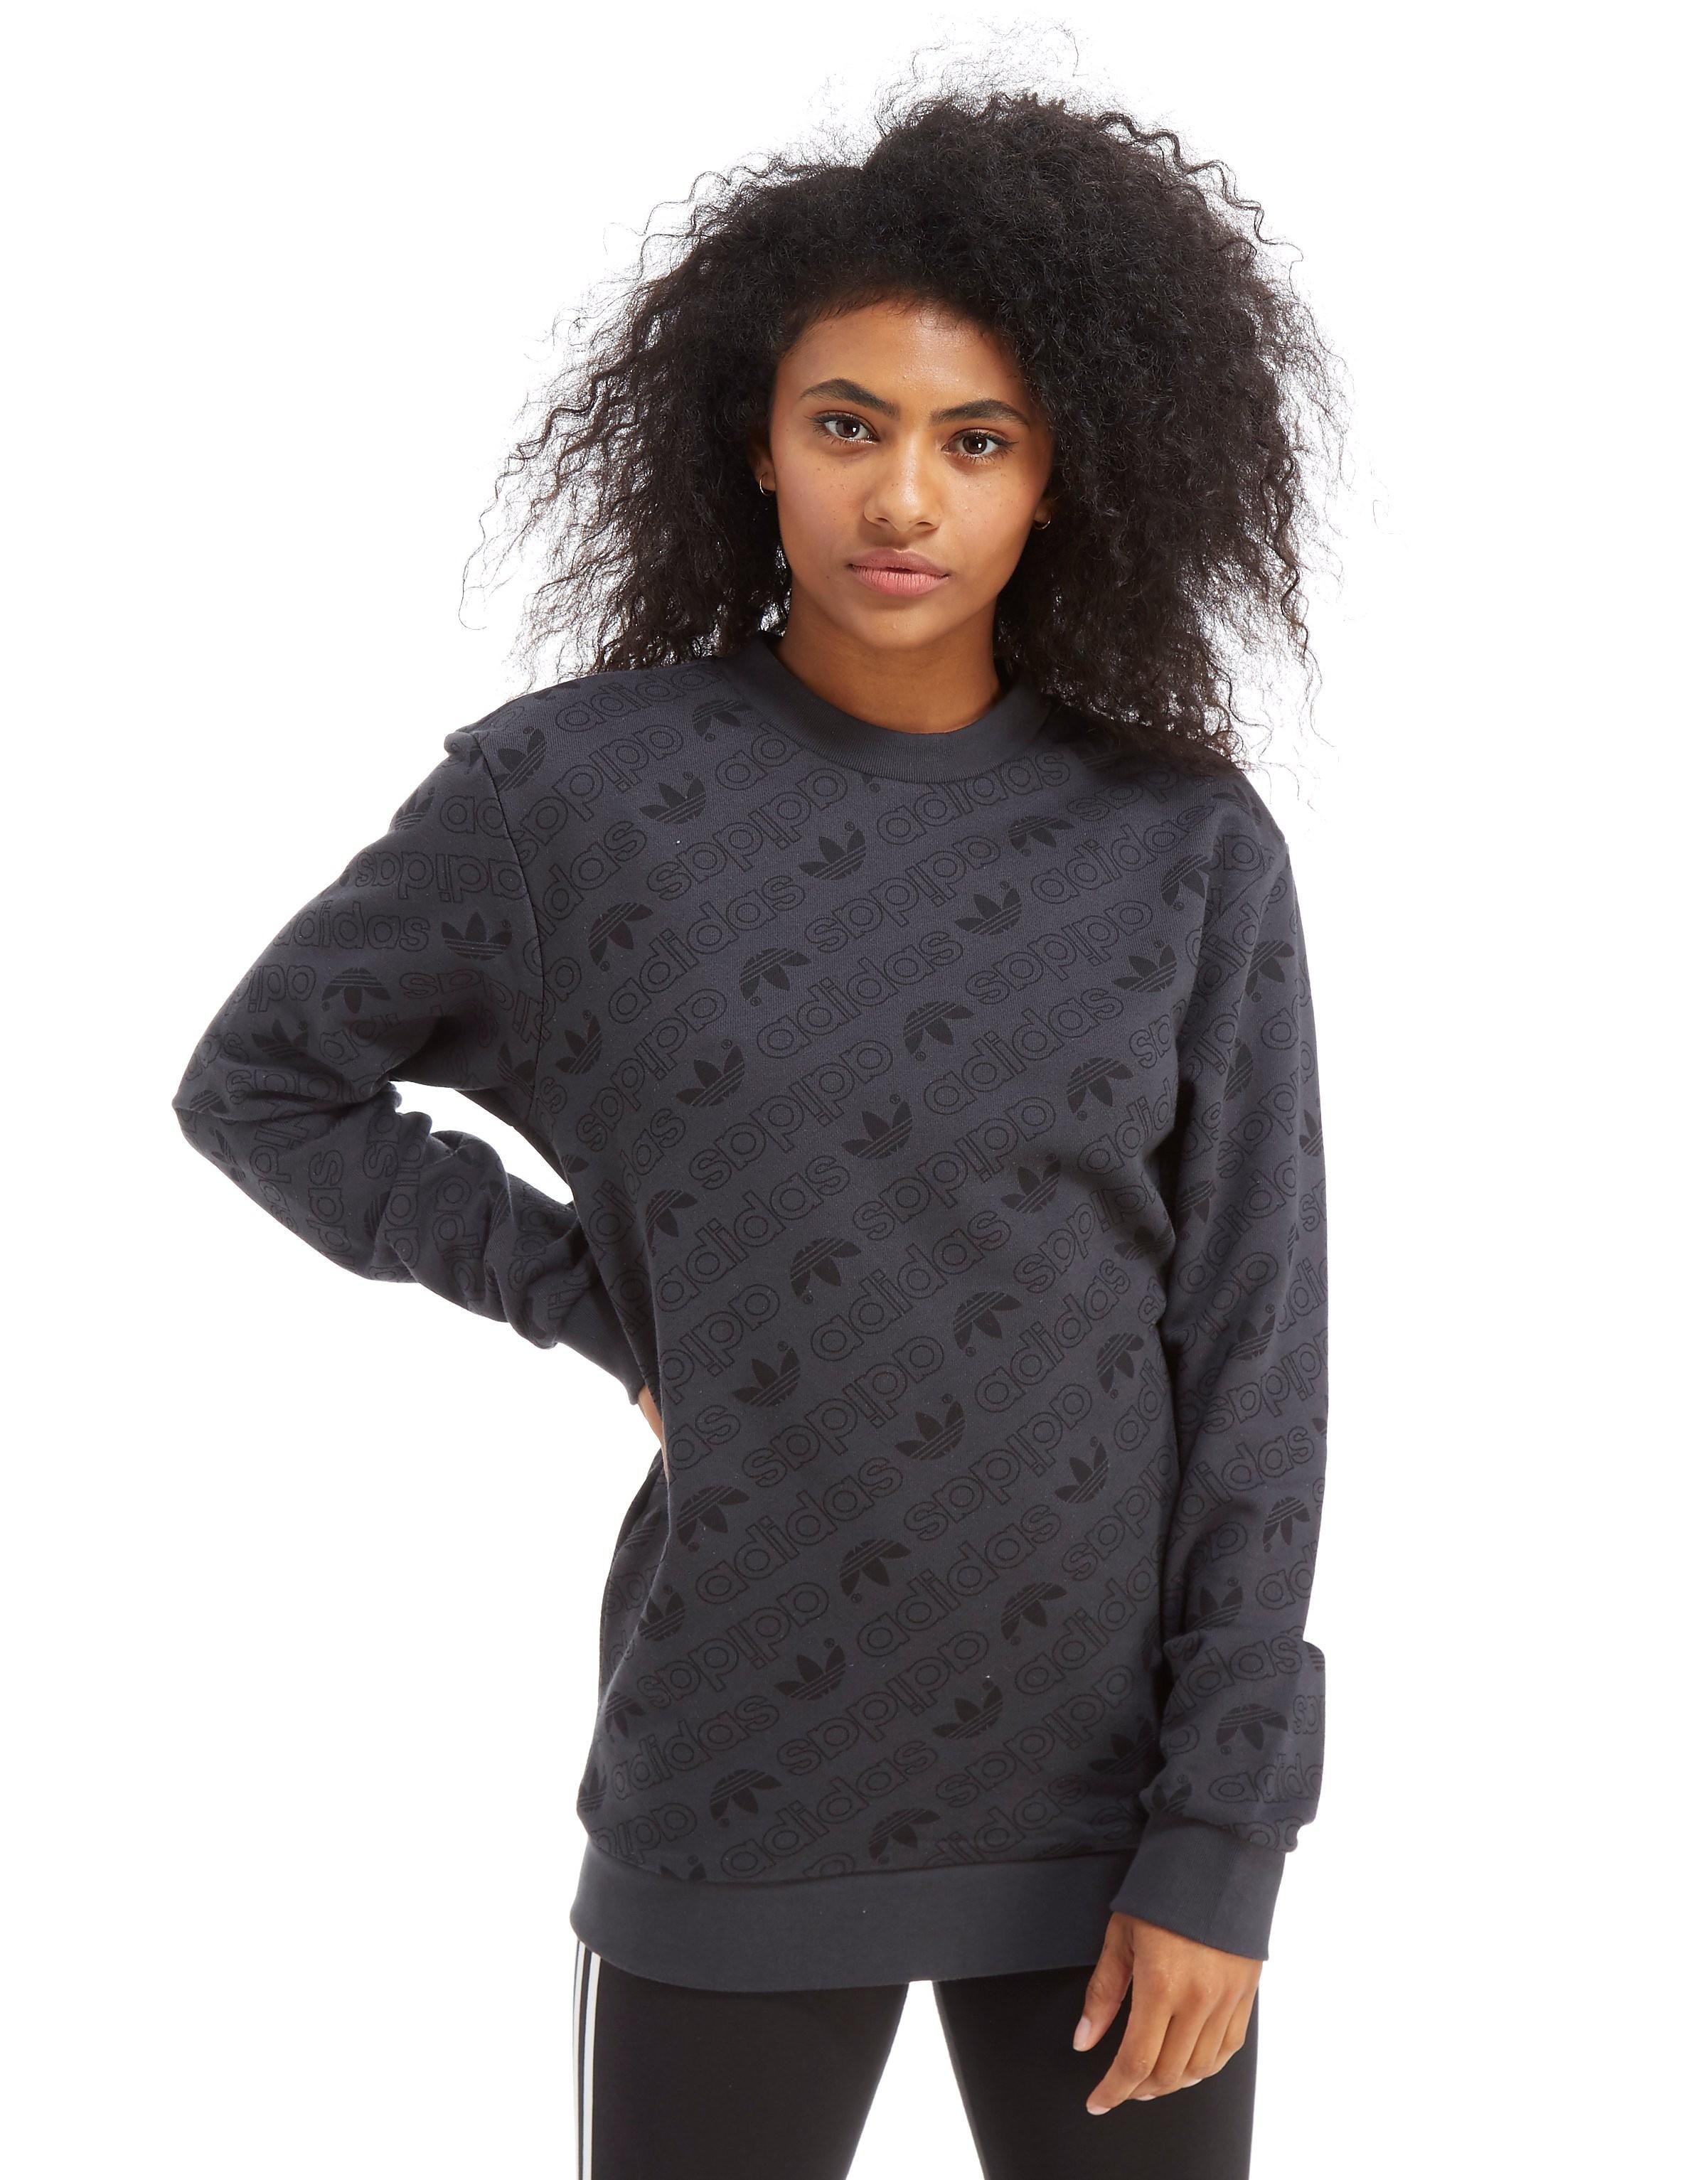 adidas Originals All Over Print Crew Sweatshirt